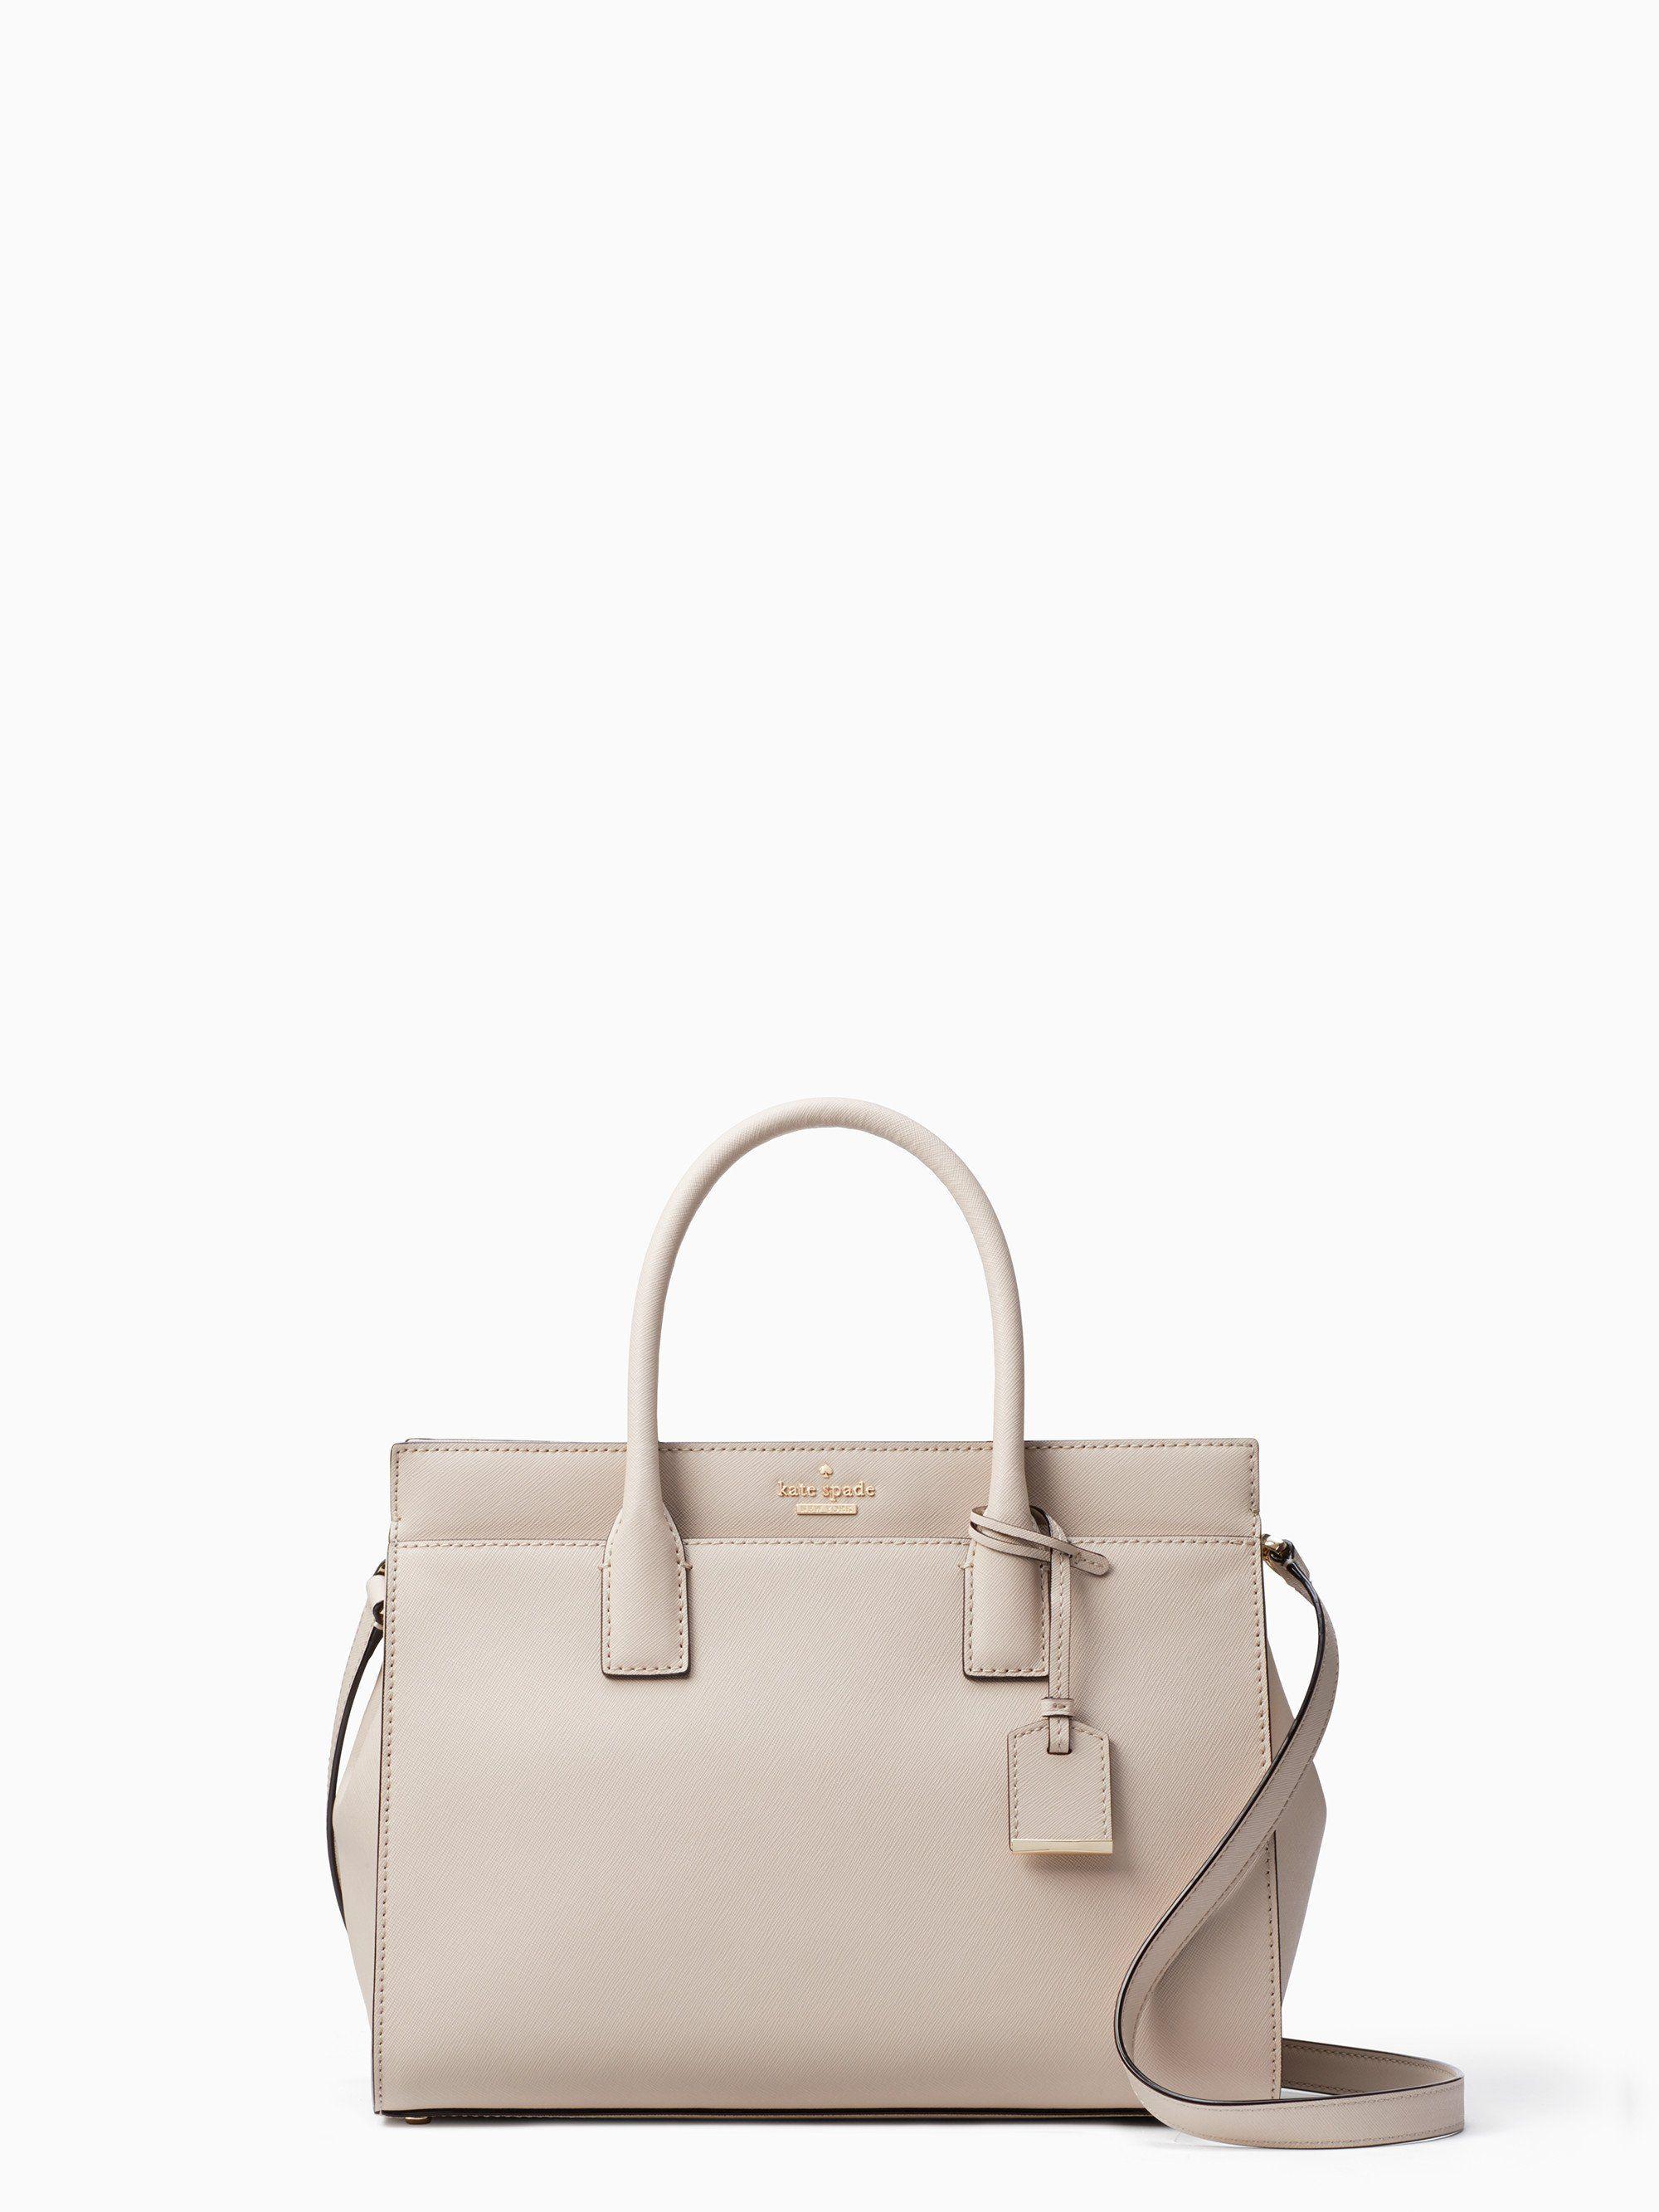 d7b0b4b79d5d ... on Handbags by Patricia Cowley. cameron street lucie crossbody by kate  spade new york